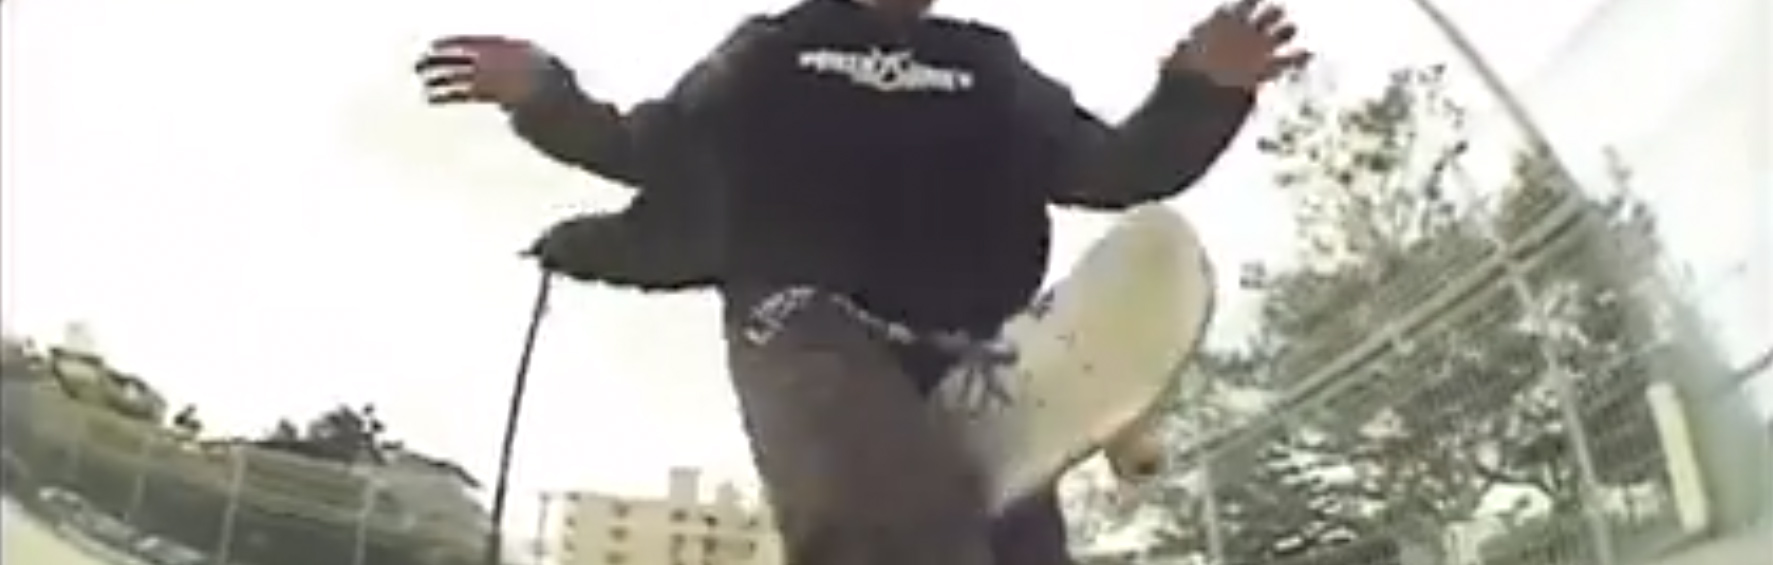 Skateboarden mal ganz anders